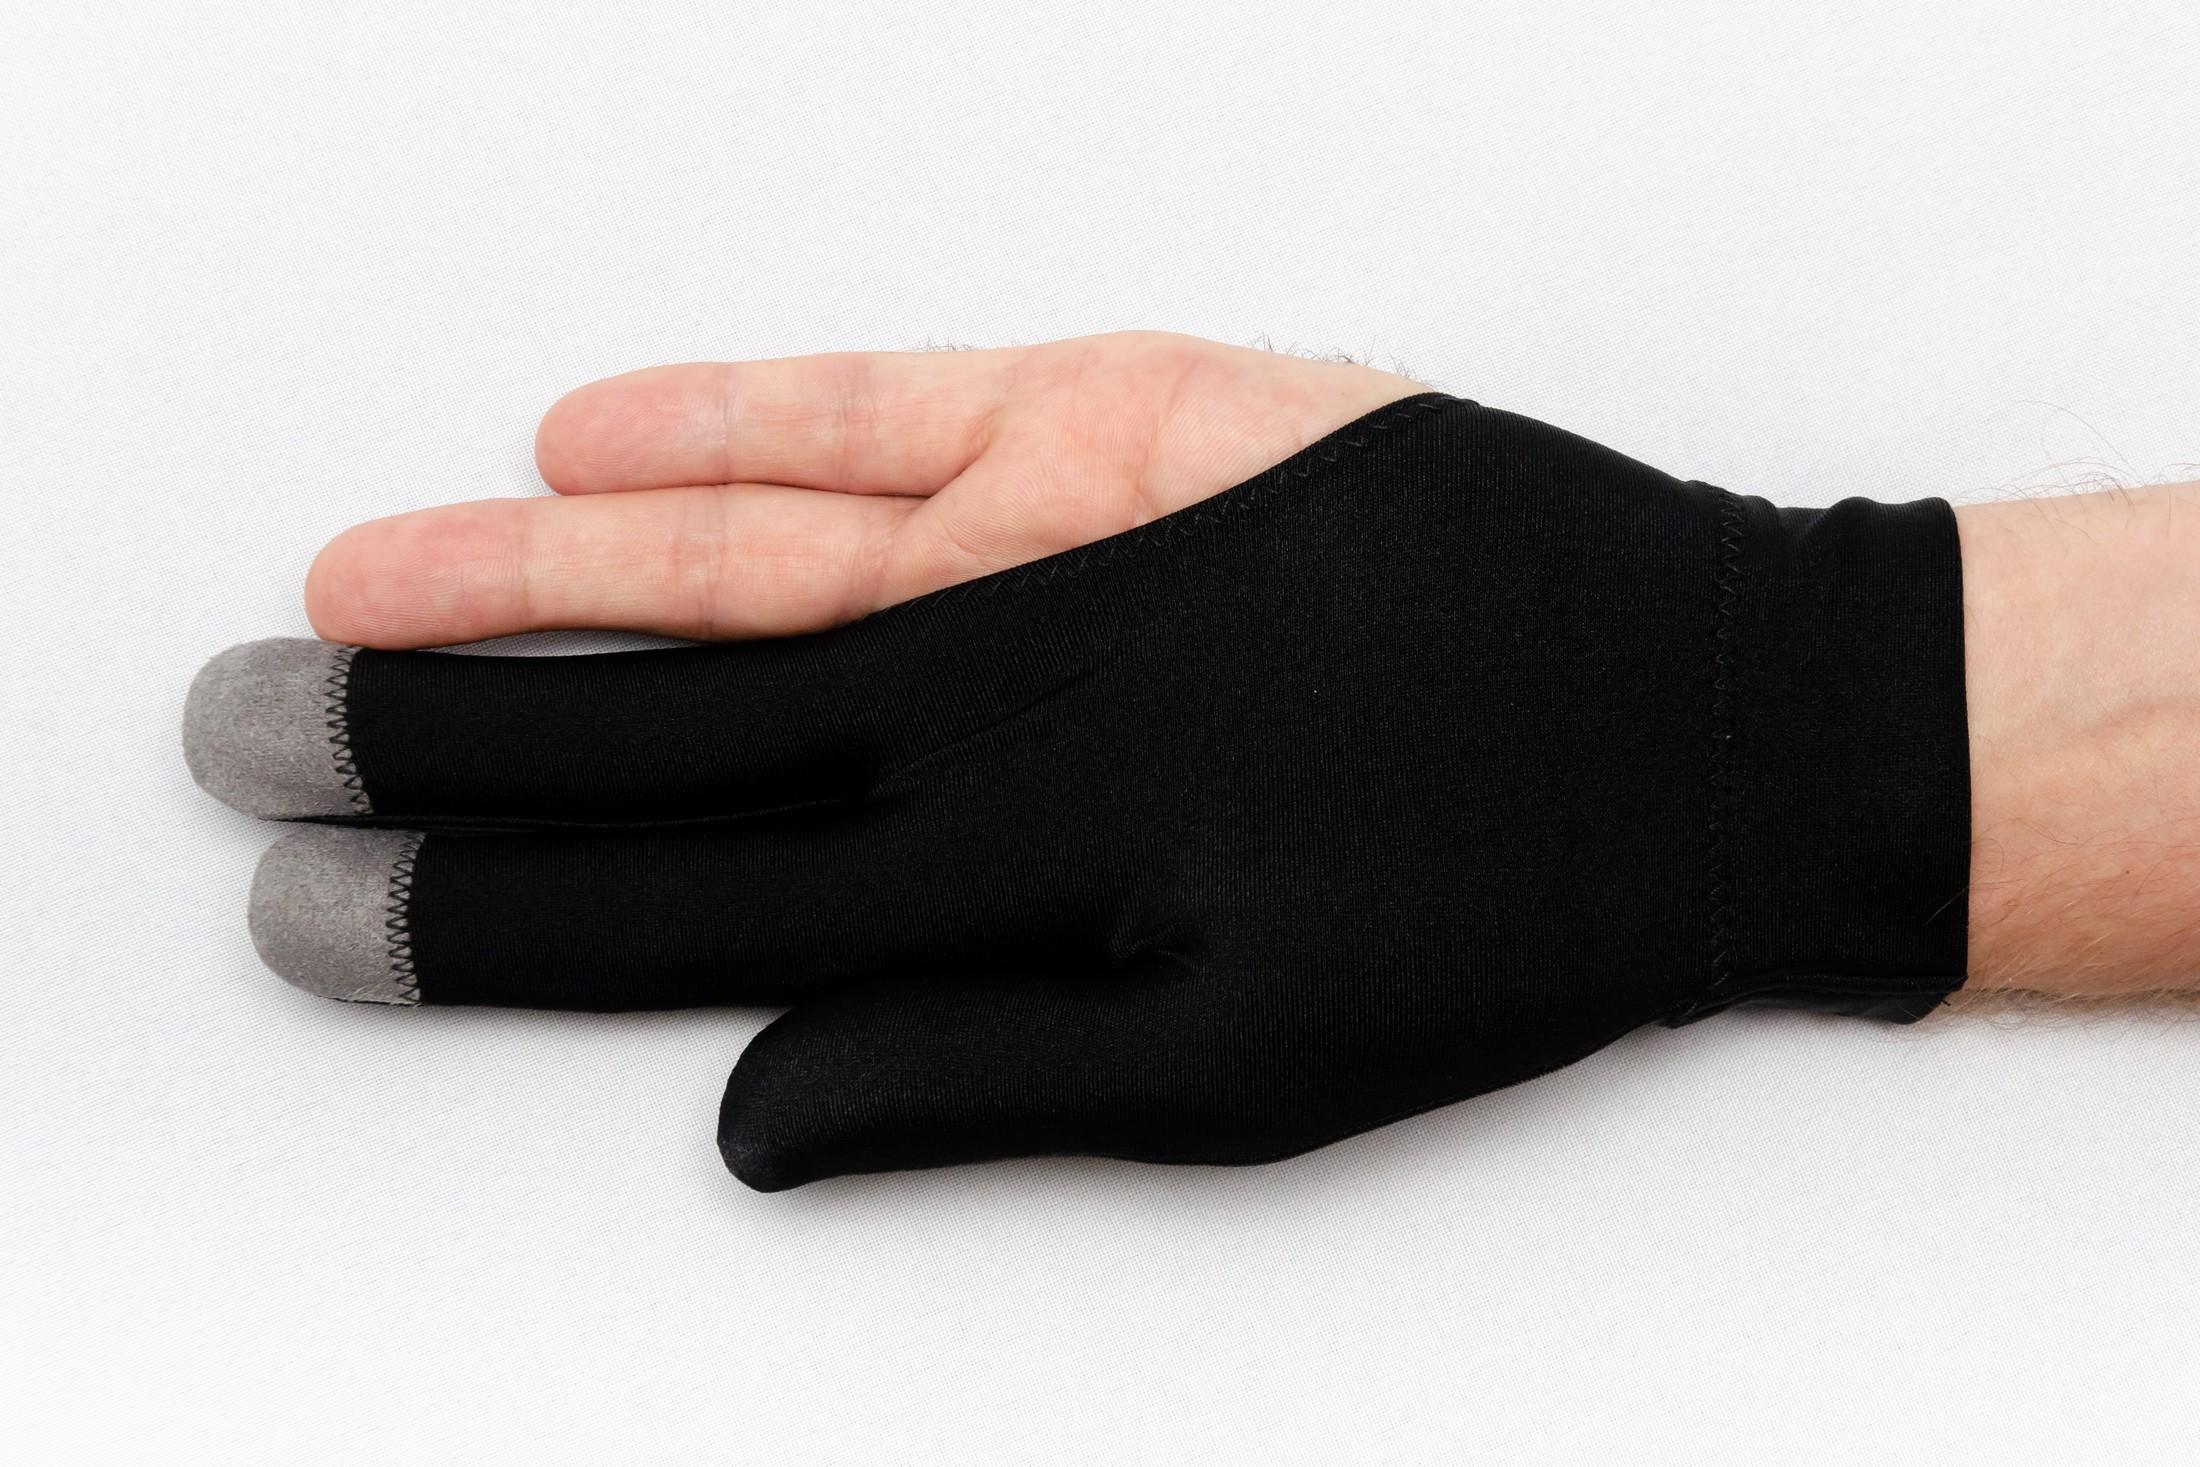 Перчатка Skiba Vistory вставки на пальцах черная M/L